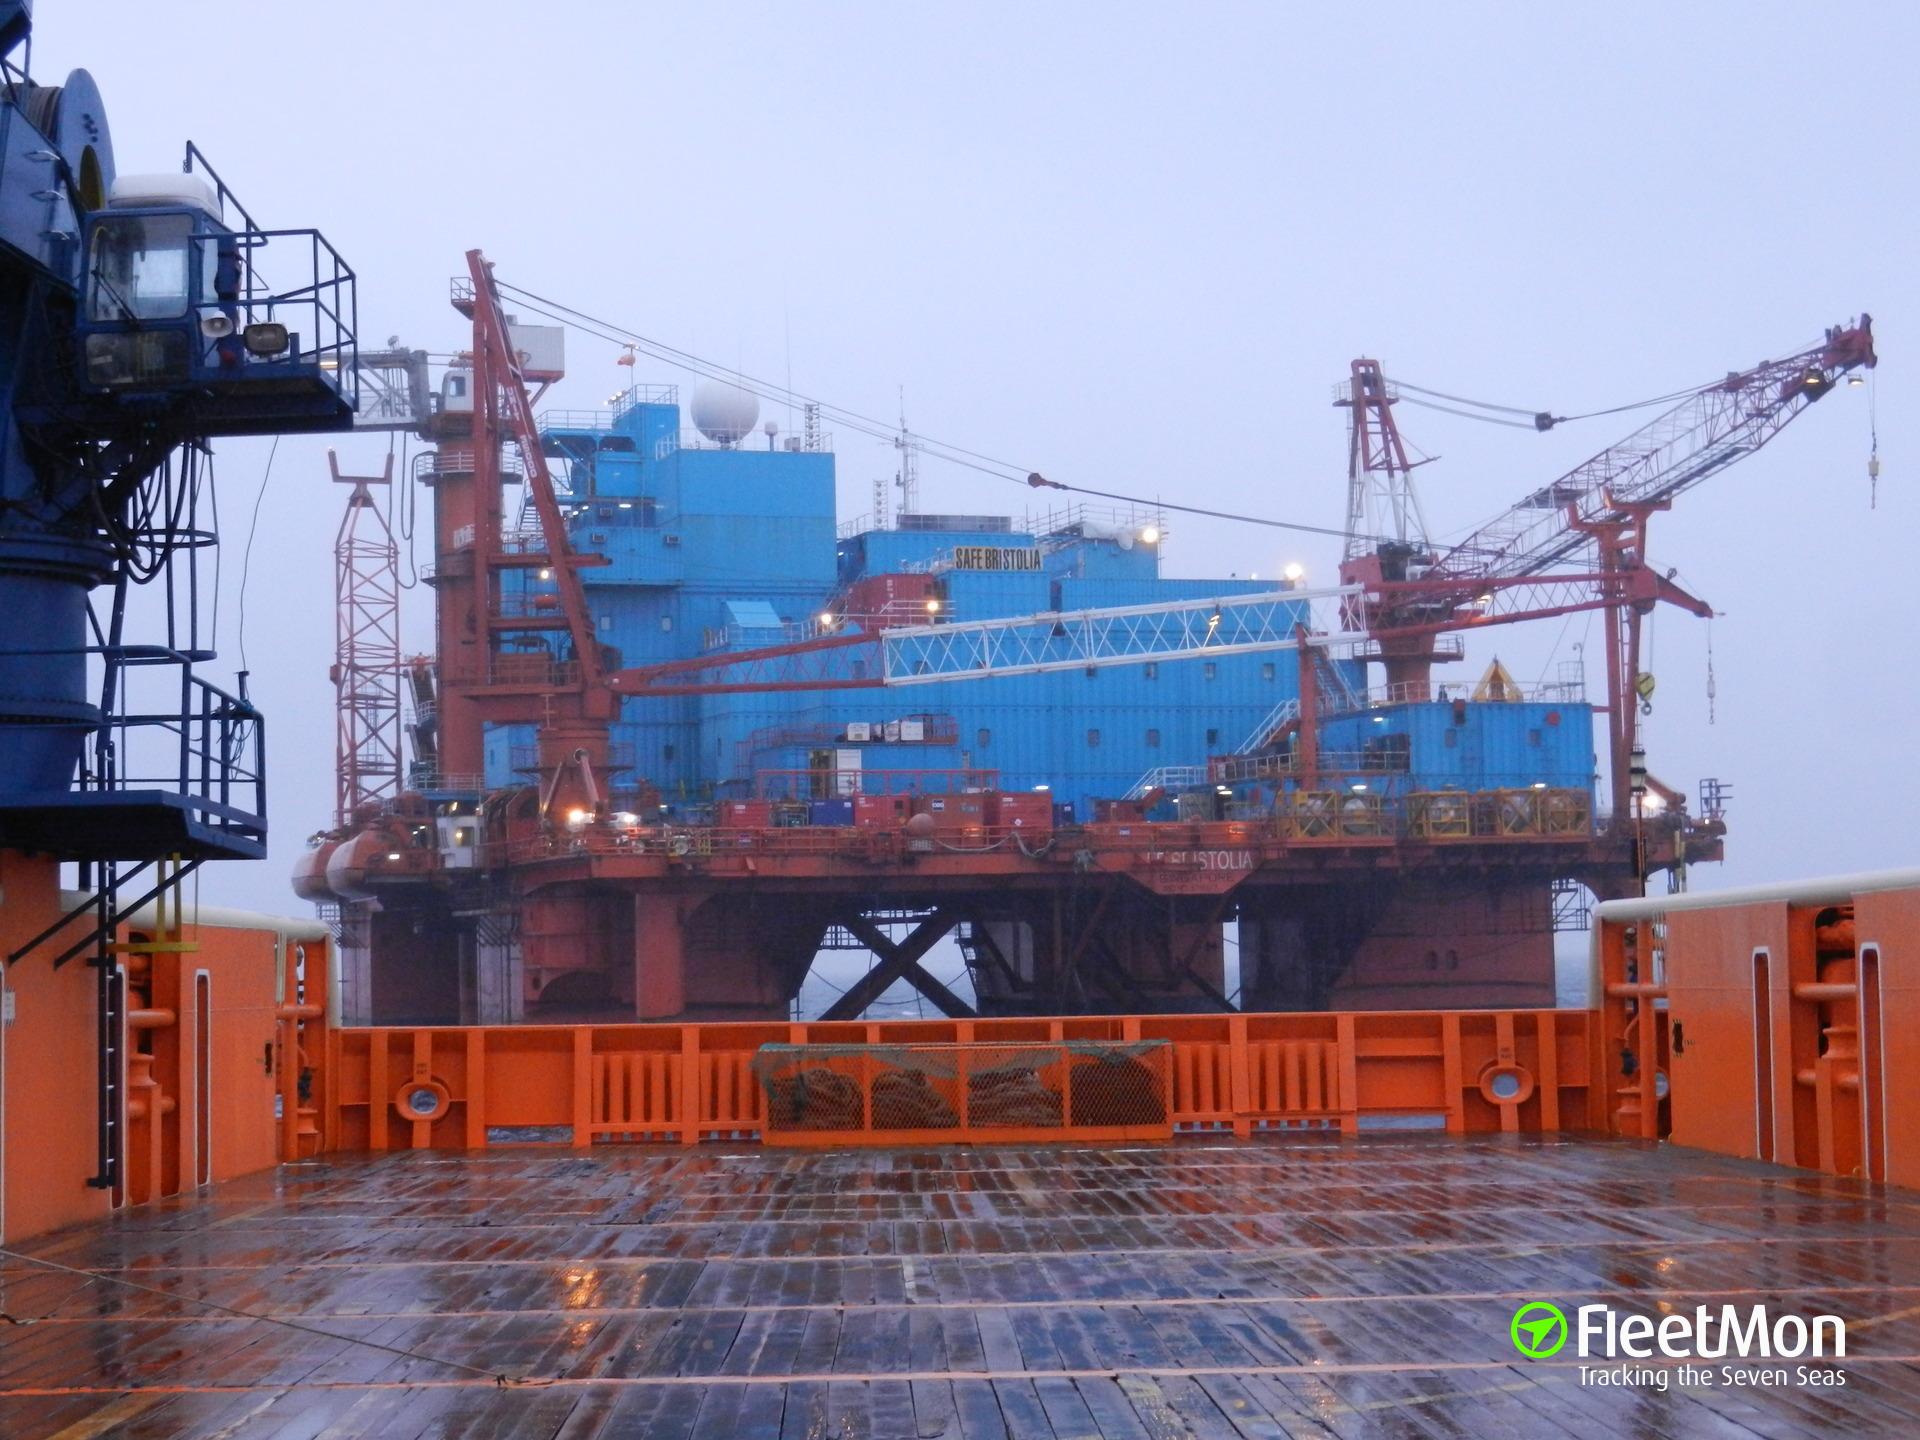 Offshore platform SAFE BRISTOLIA broke free in North sea